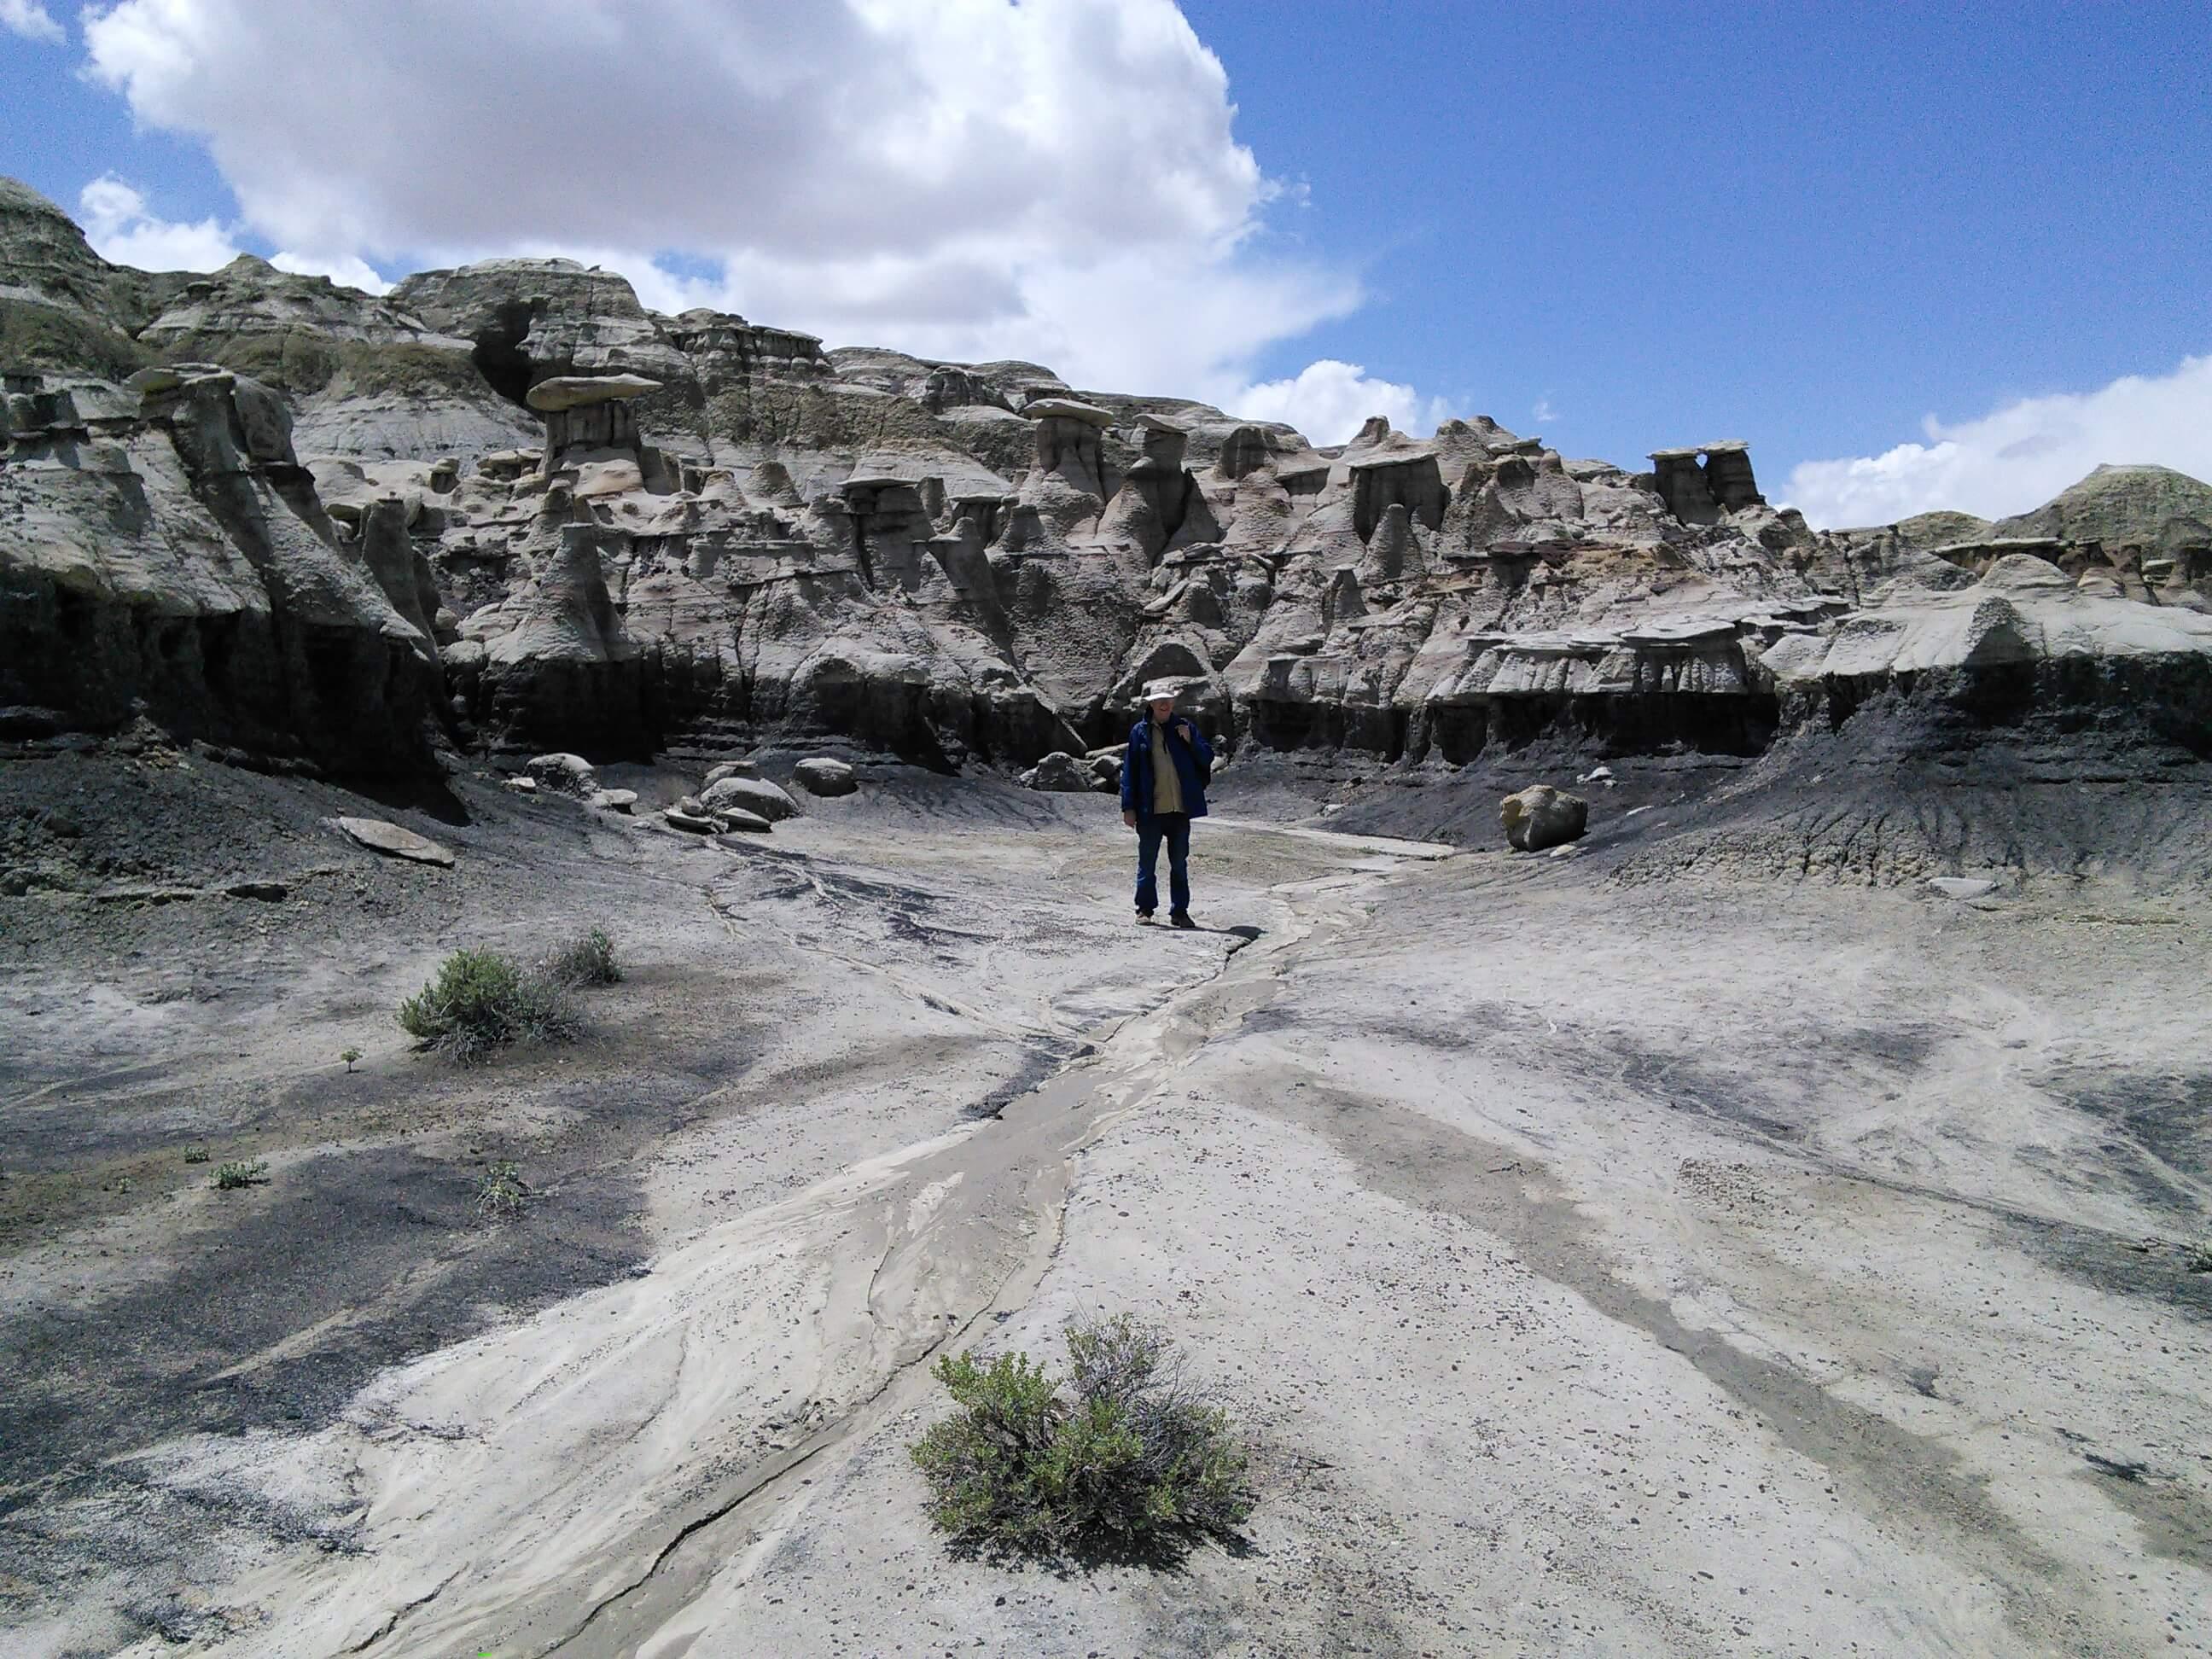 Bisti / De Na Zin Wilderness, NM